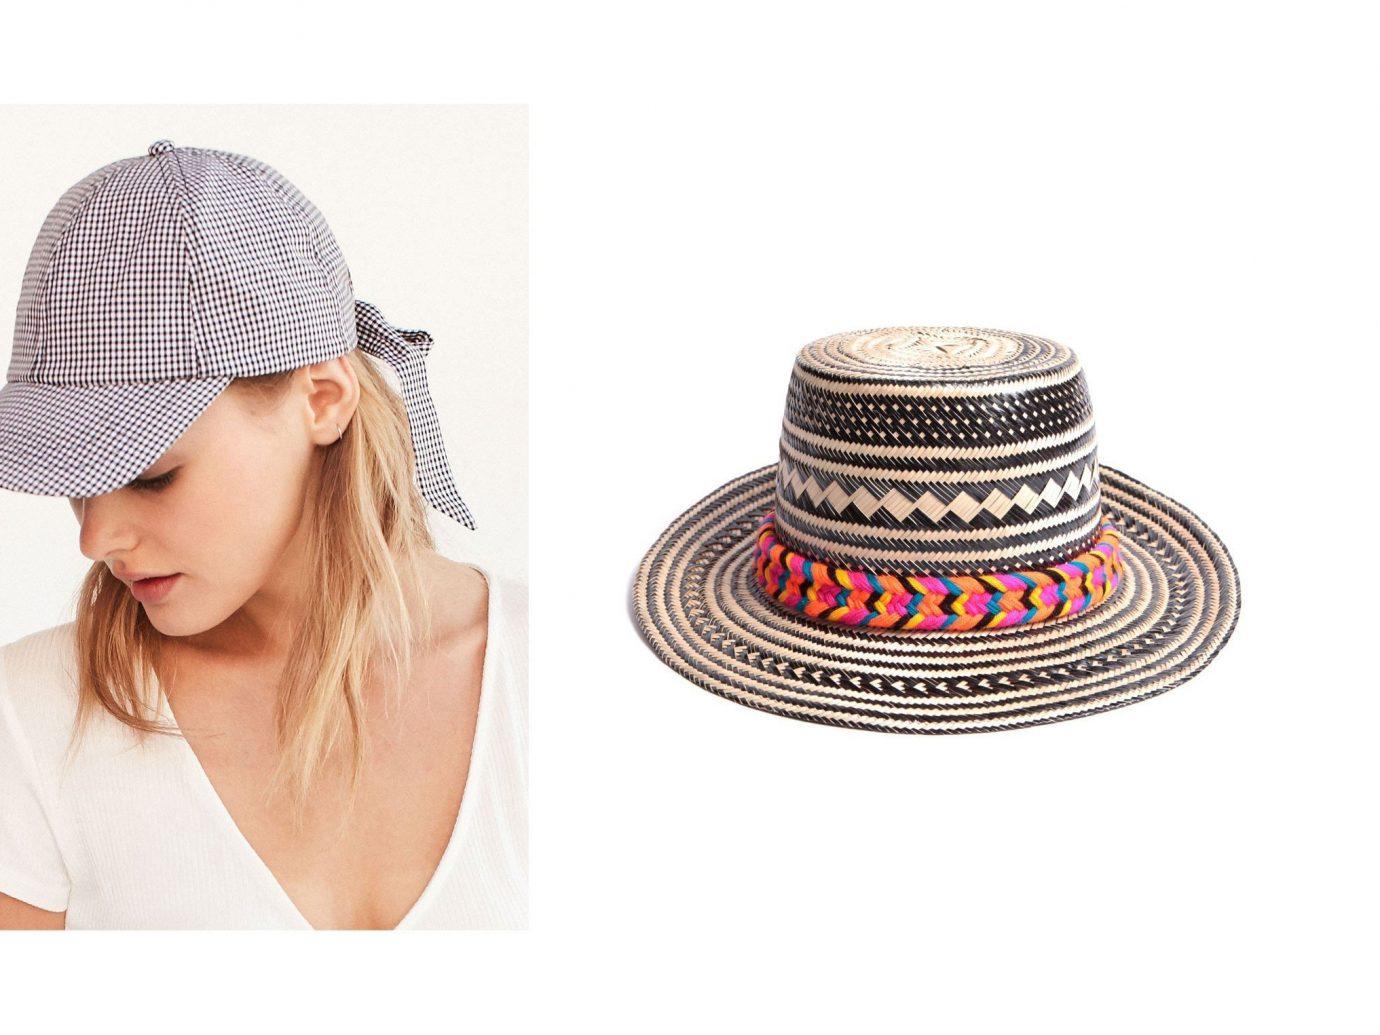 Style + Design person woman clothing fashion accessory hat cap headgear brand fedora sun hat